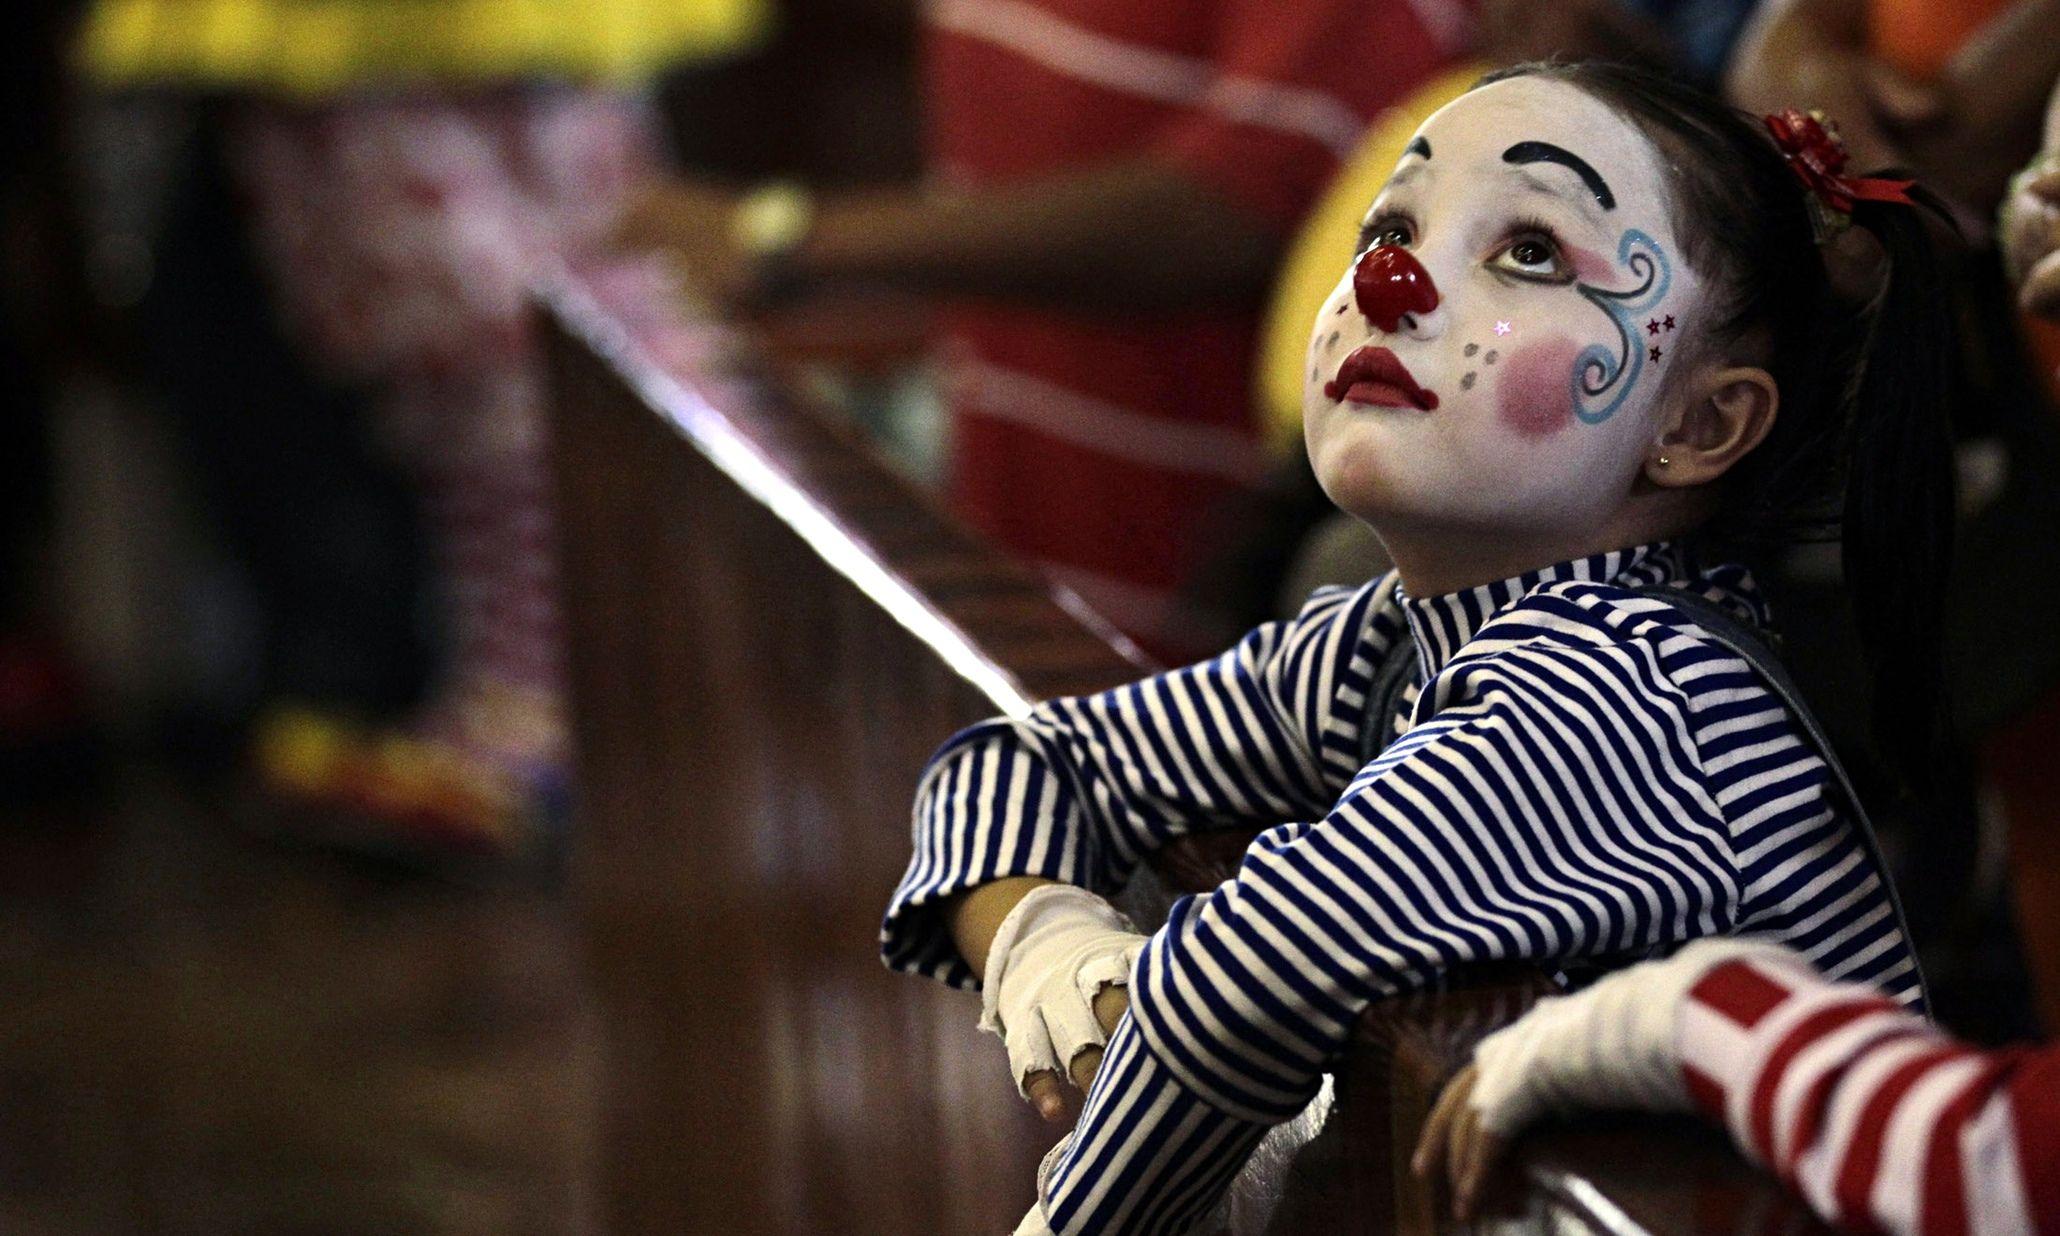 method and redman clownin some fatbull. LOL | Method man